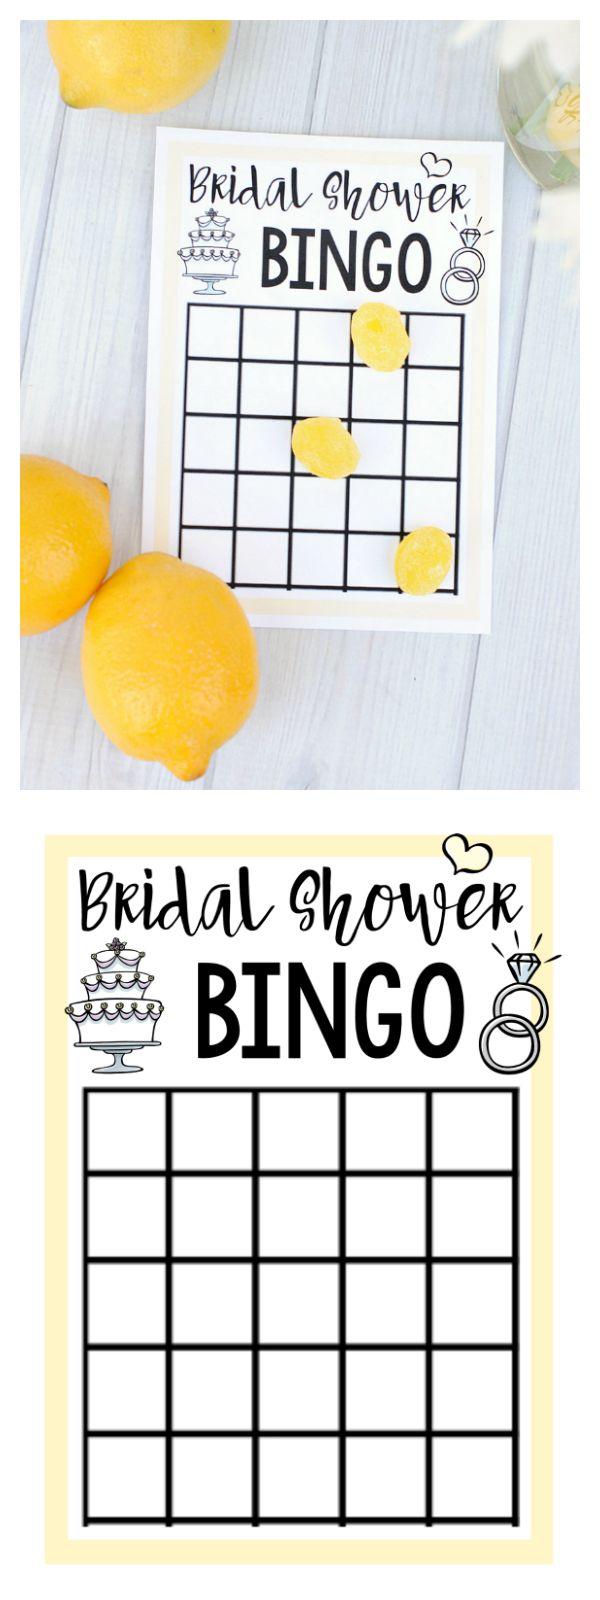 Free Printable Bridal Shower Bingo Game